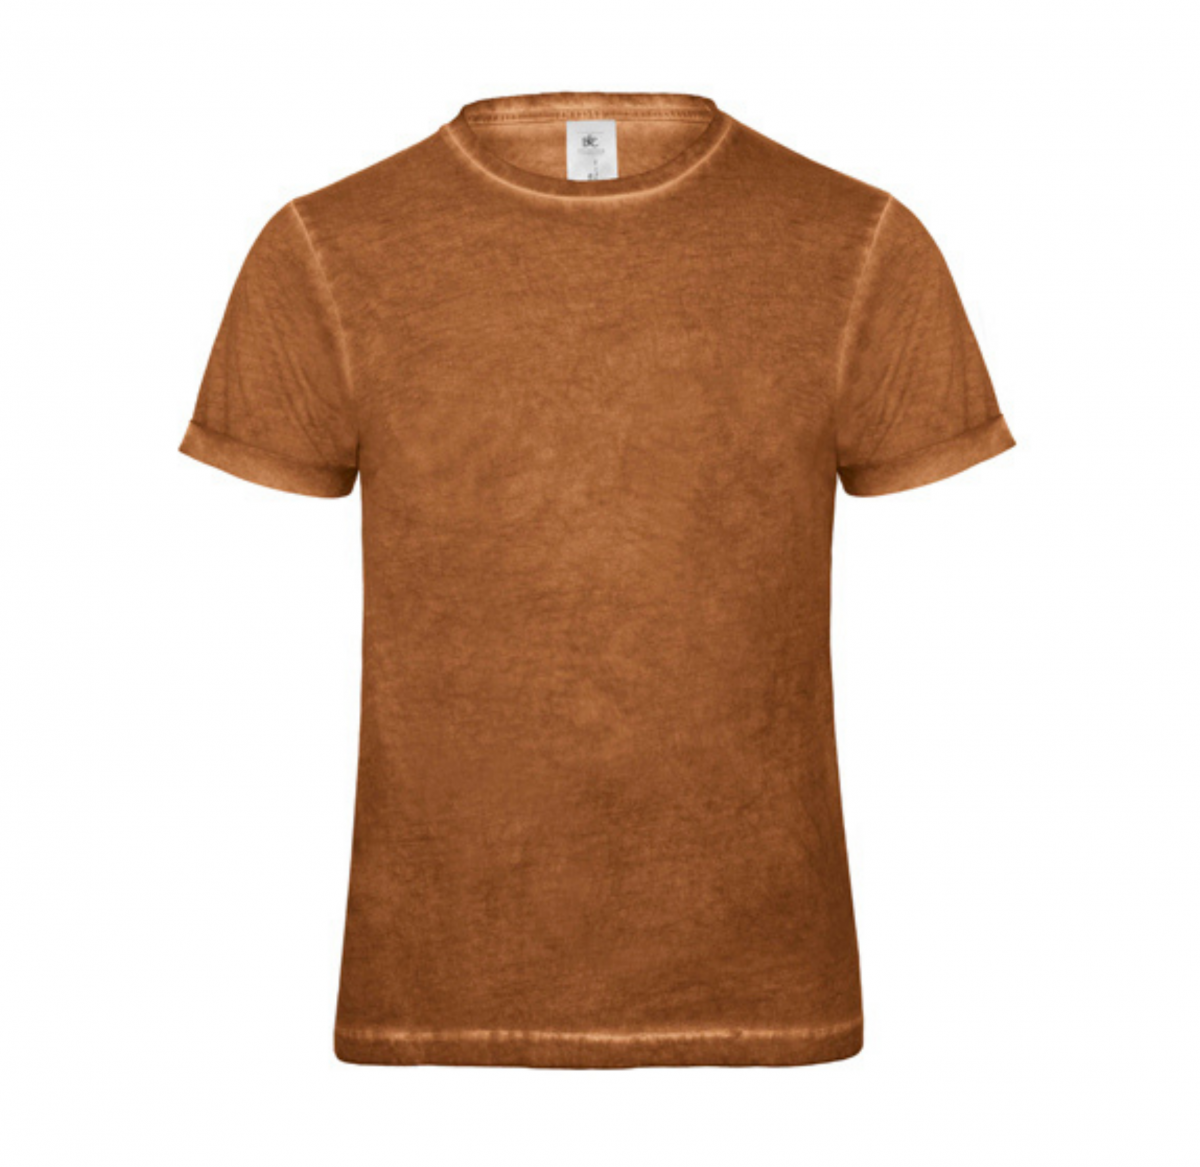 Tee-Shirt Homme Vintage - Cuir fauve